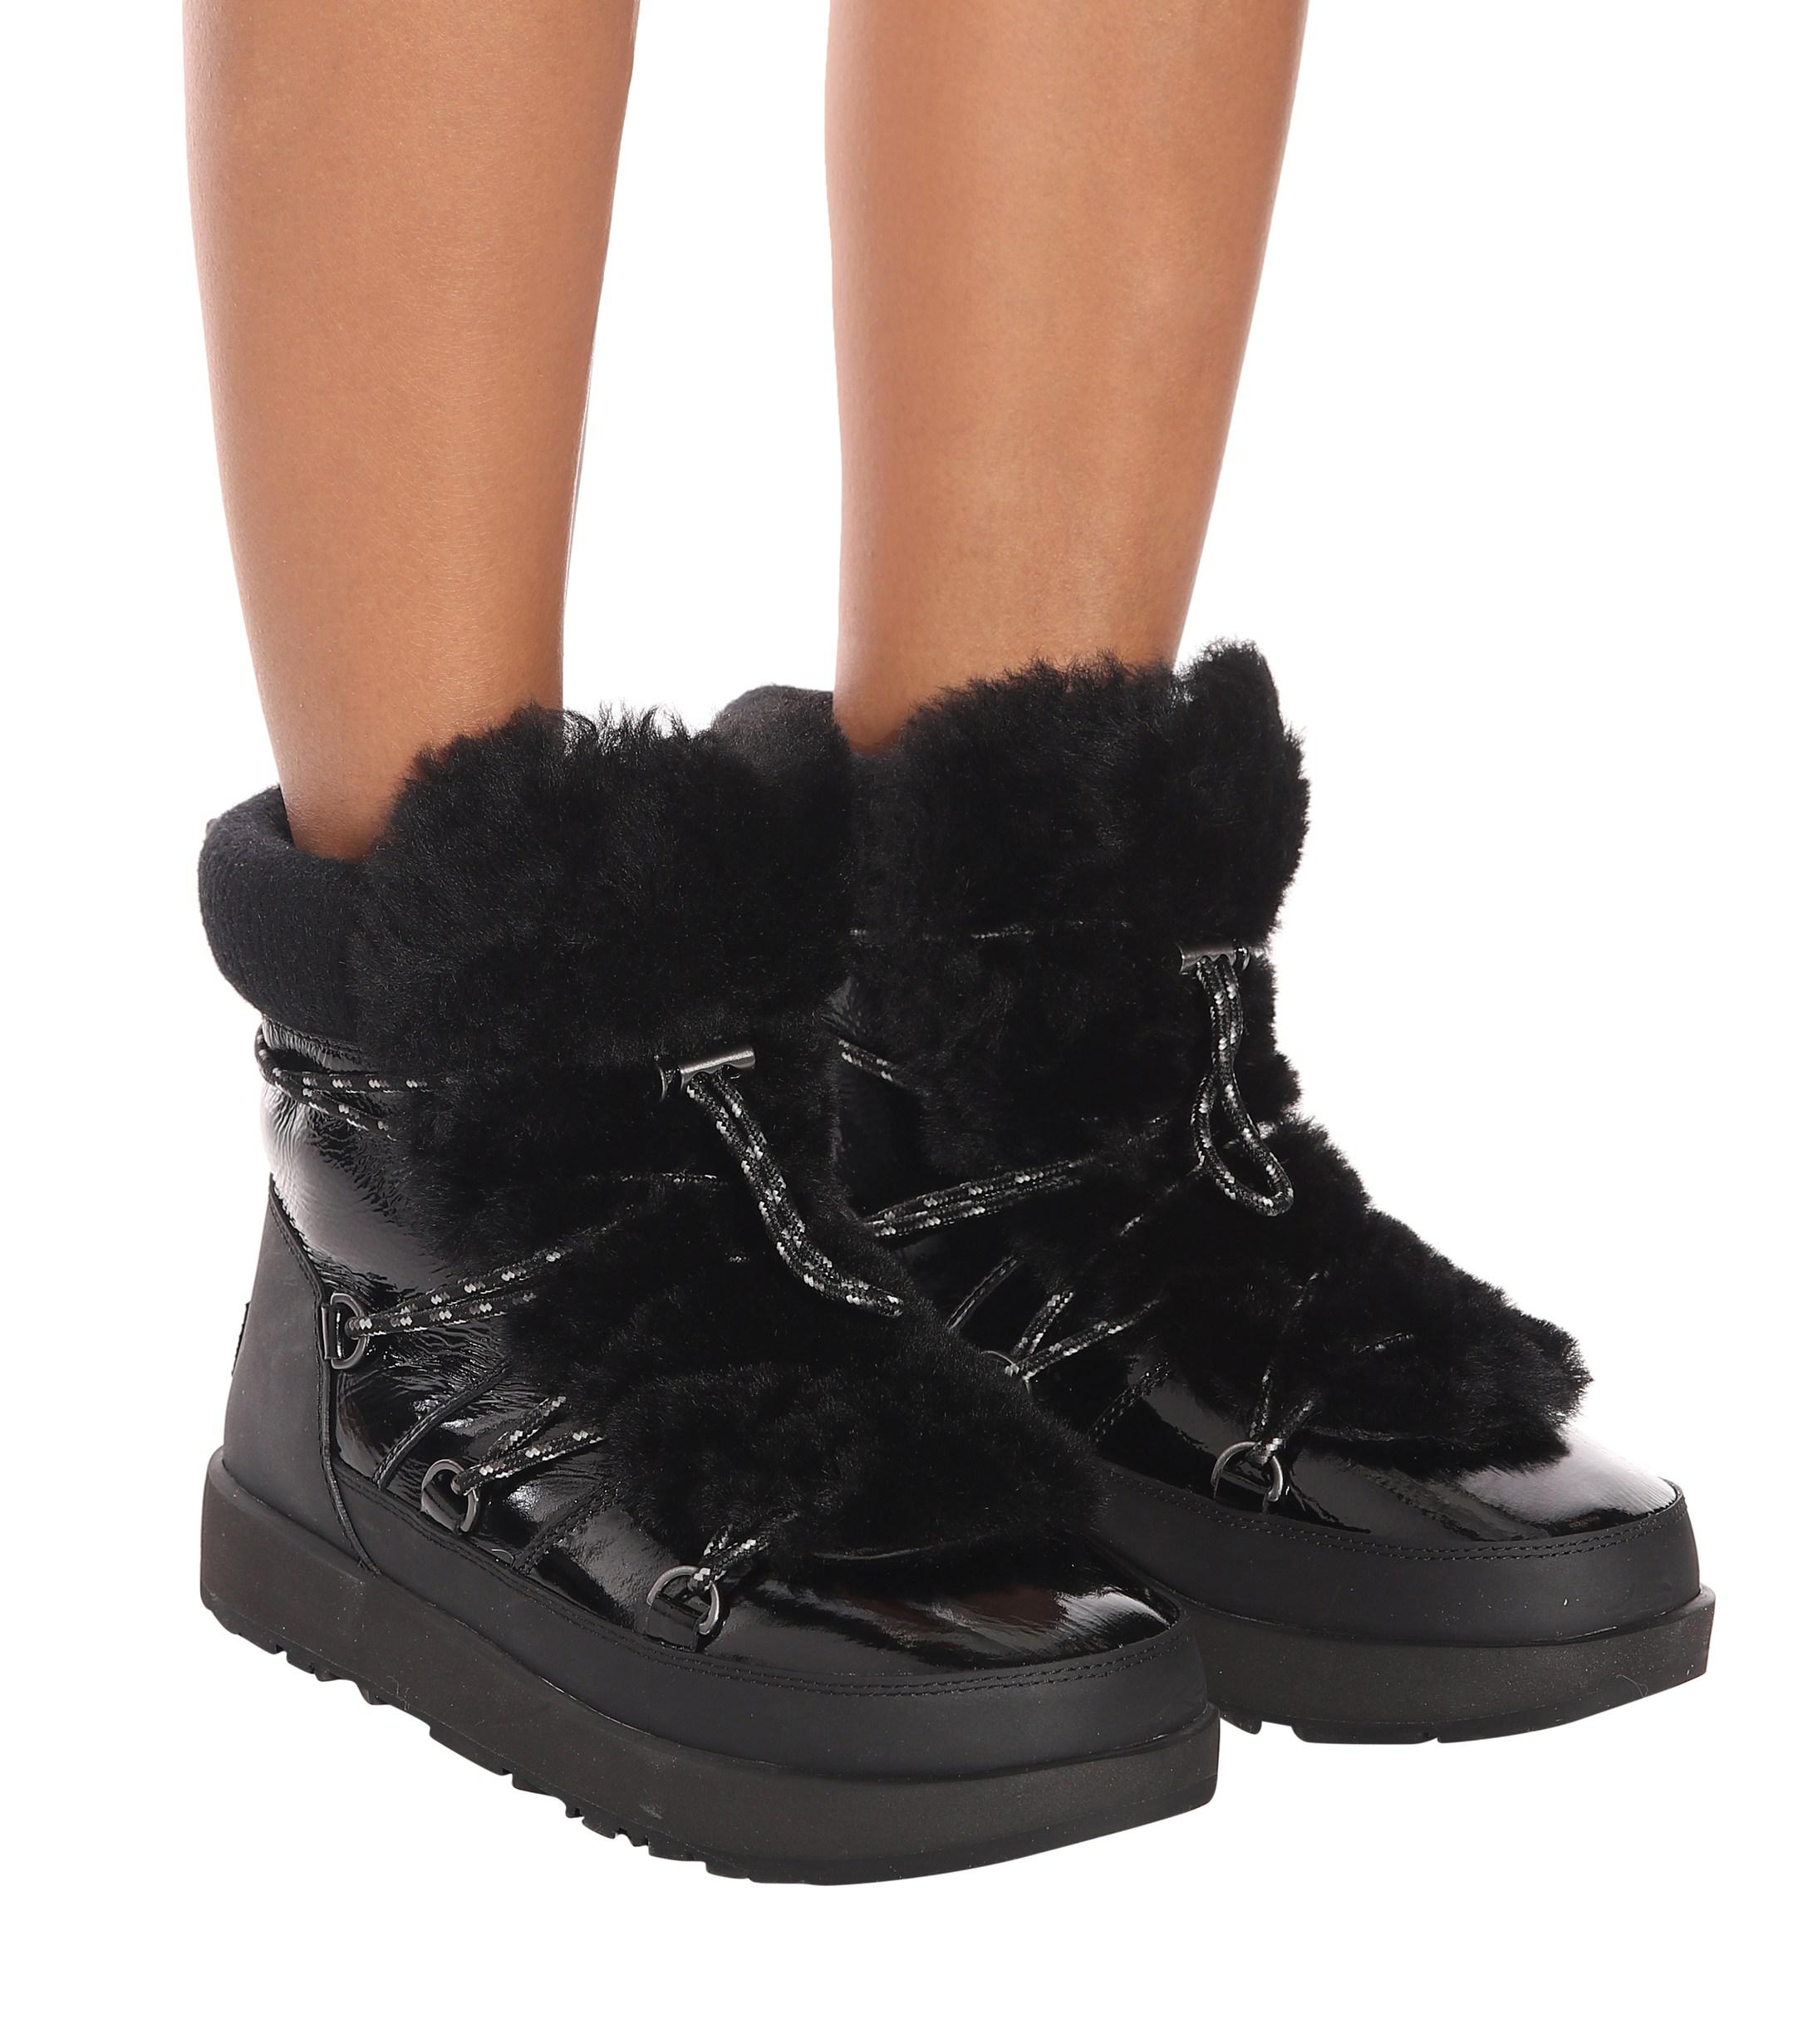 866faad8bd8 Women's Black Highland Waterproof Ankle Boots